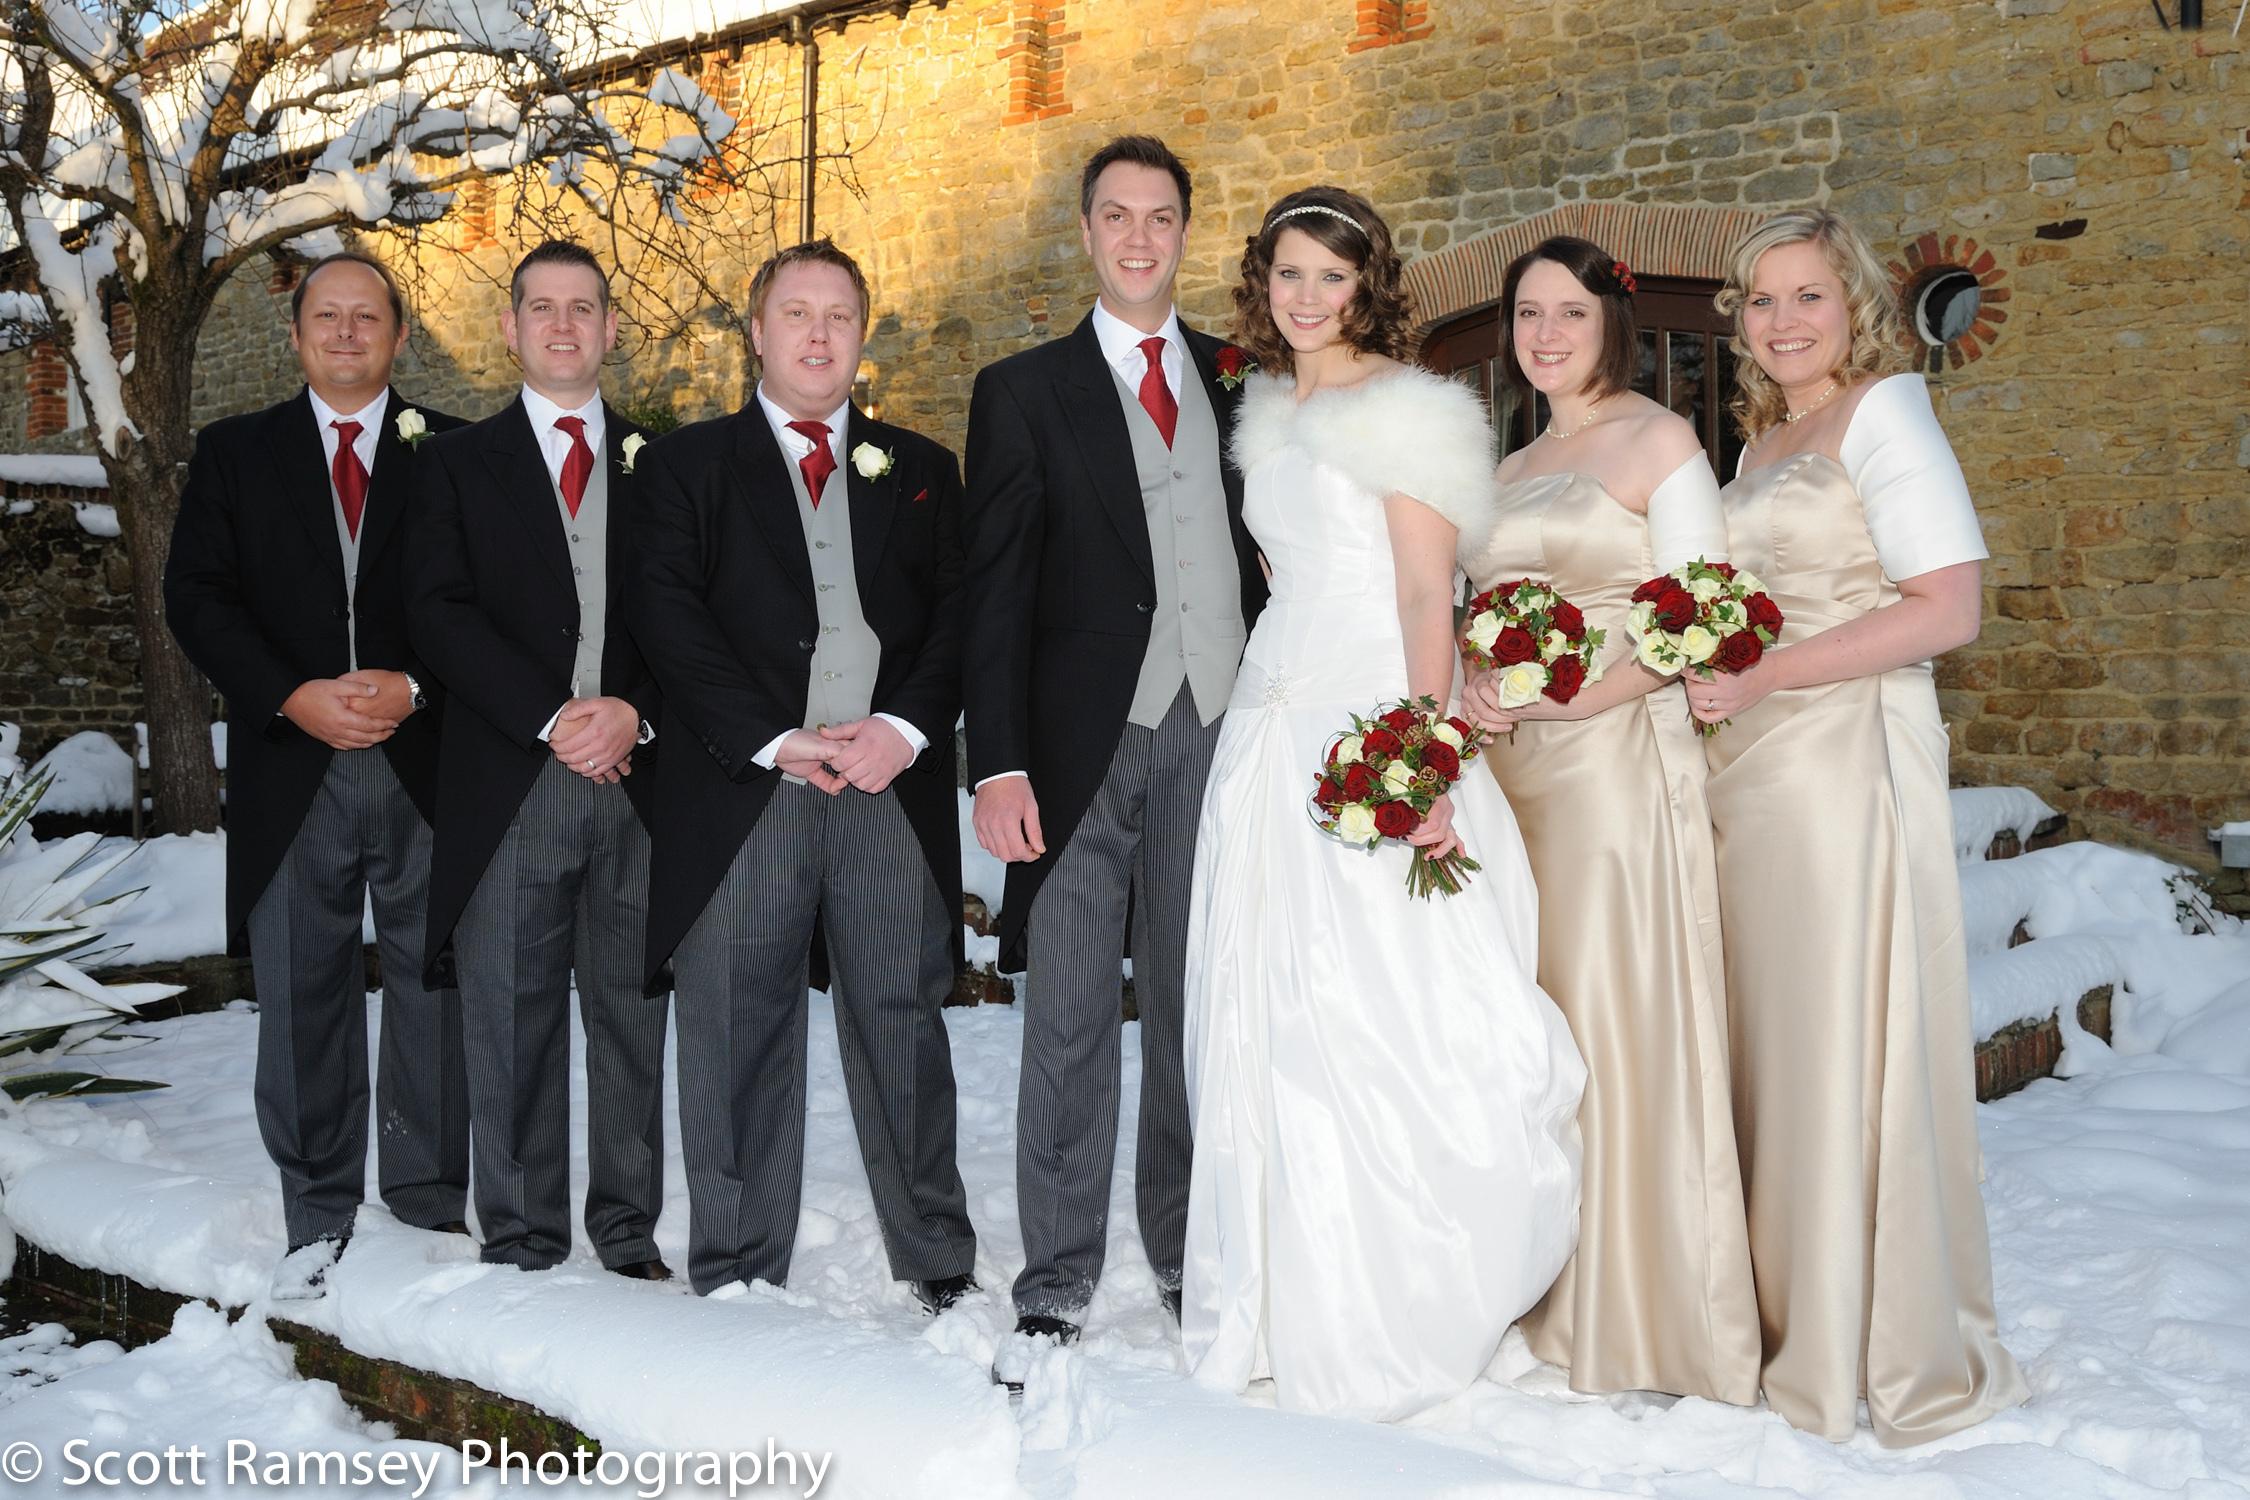 Winter-Wedding-Spread-Eagle-Hotel-Midhurst-Bride-Groom-Ushers-Br